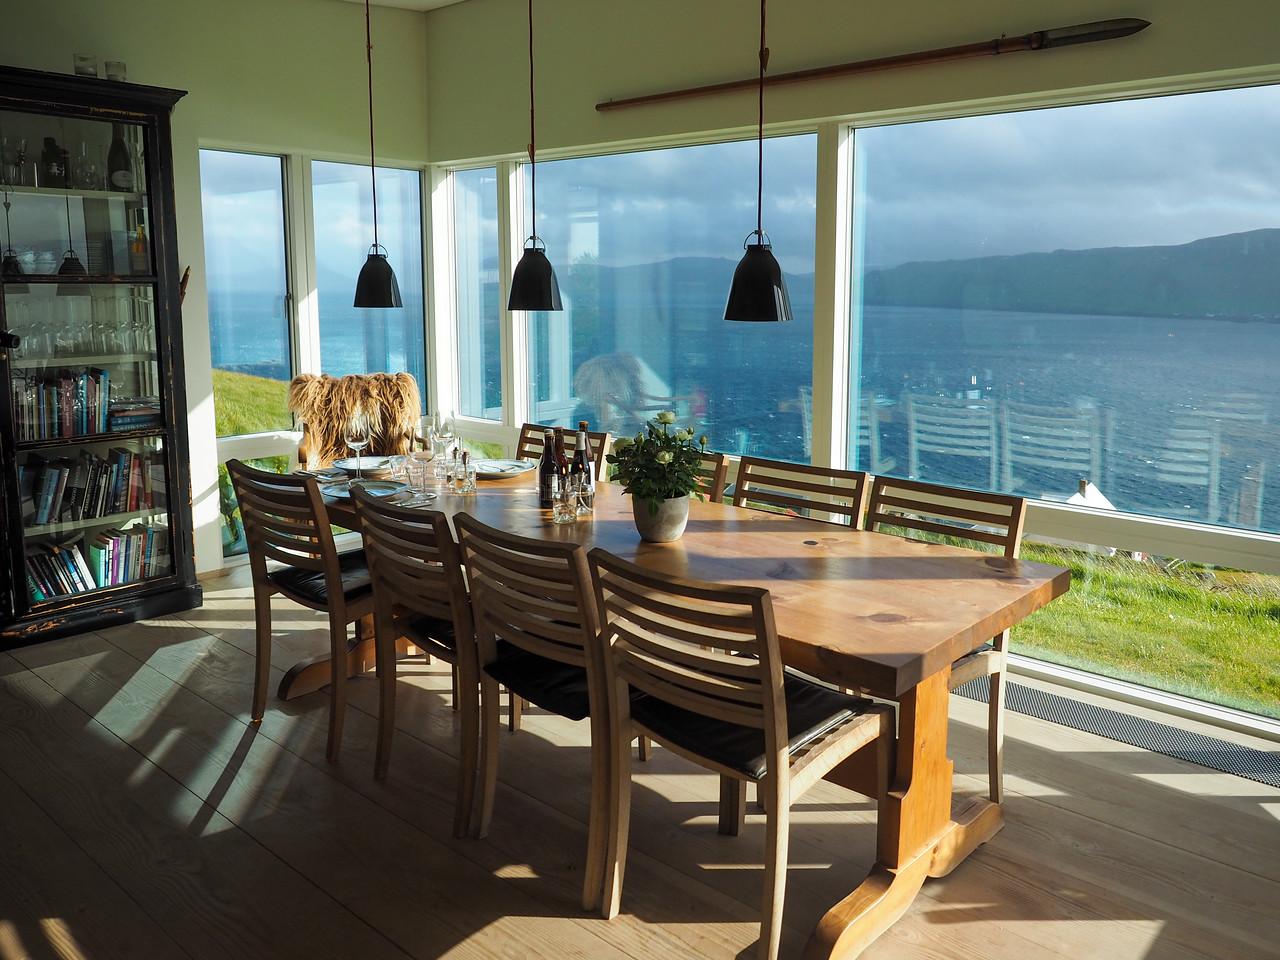 Dinner with farmers in the Faroe Islands